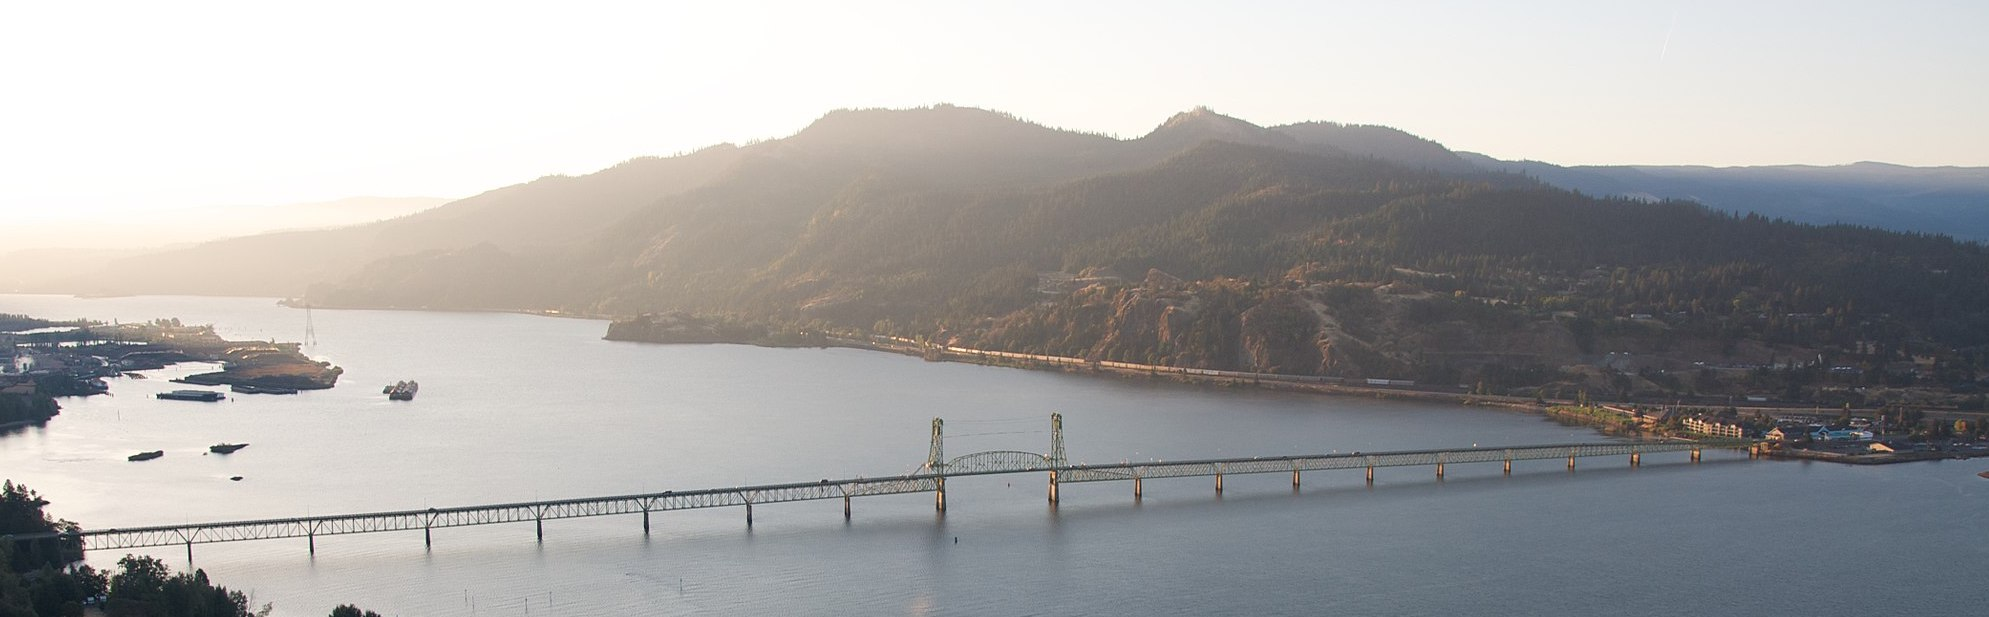 2048px-Hood_River_Bridge_banner.jpg